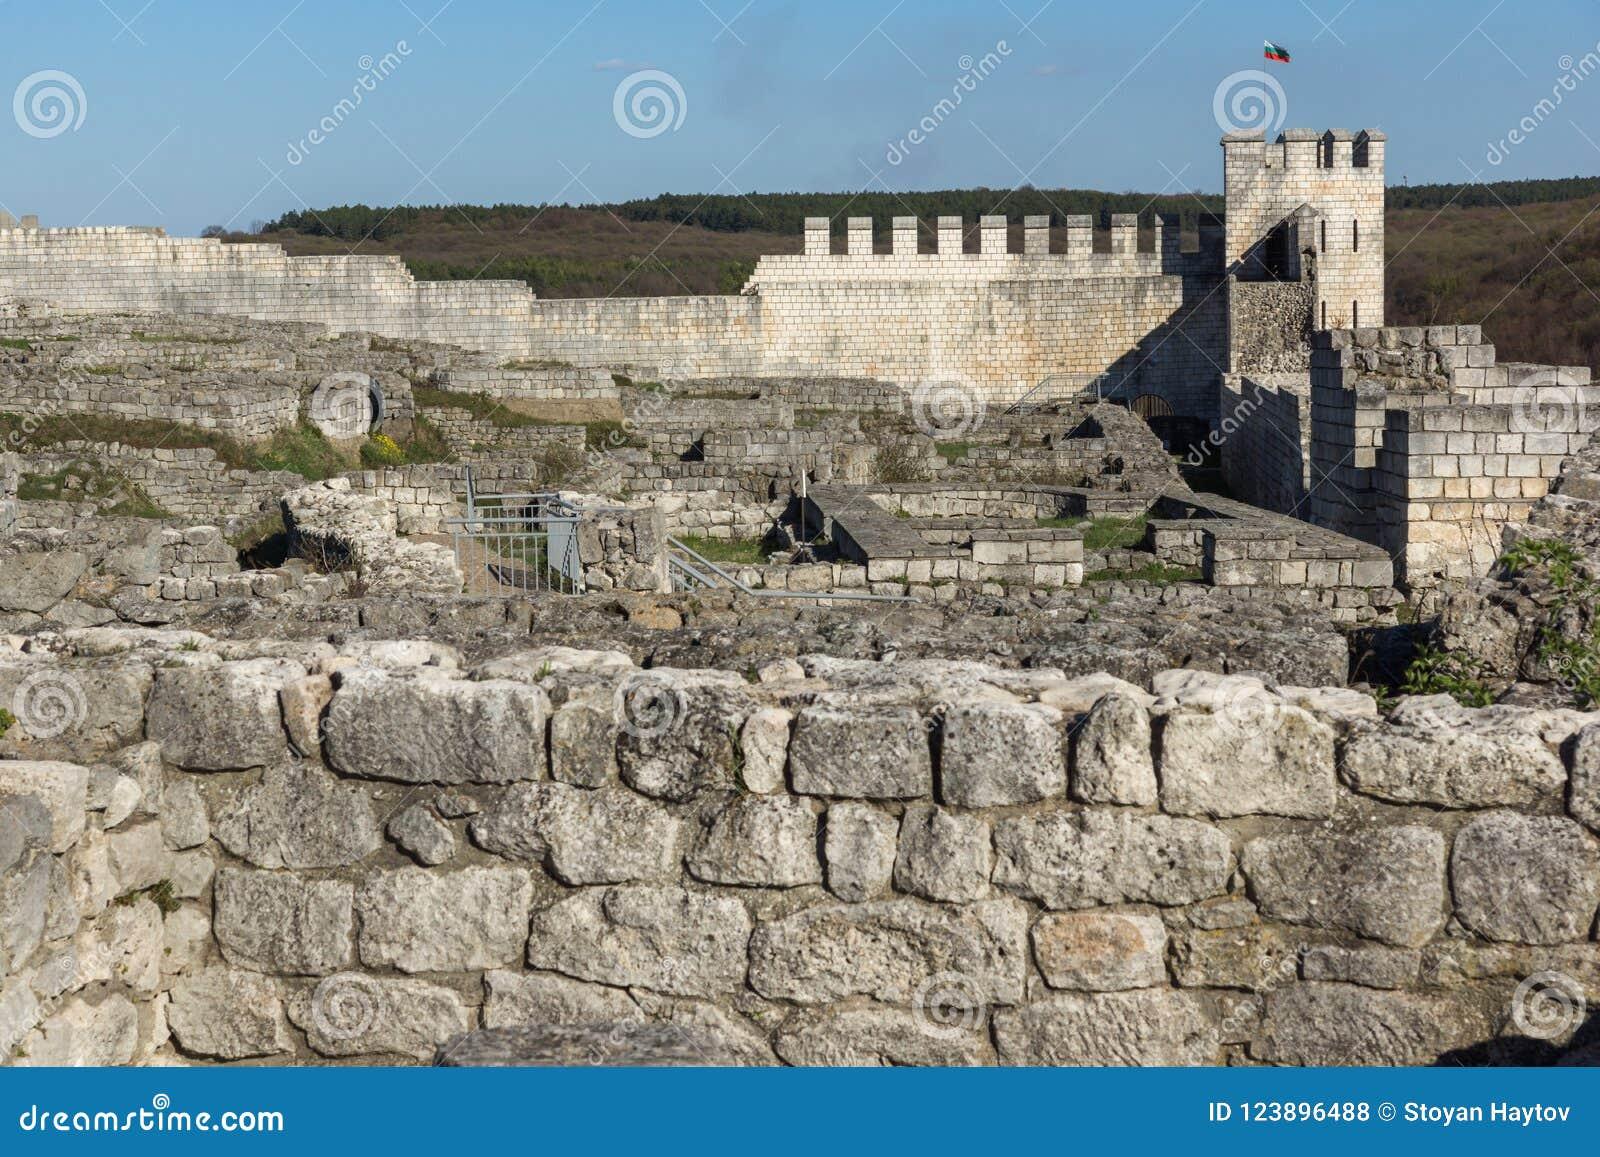 Shumen Fortress Archaeological Site Near Town Of Shoumen Bulgaria